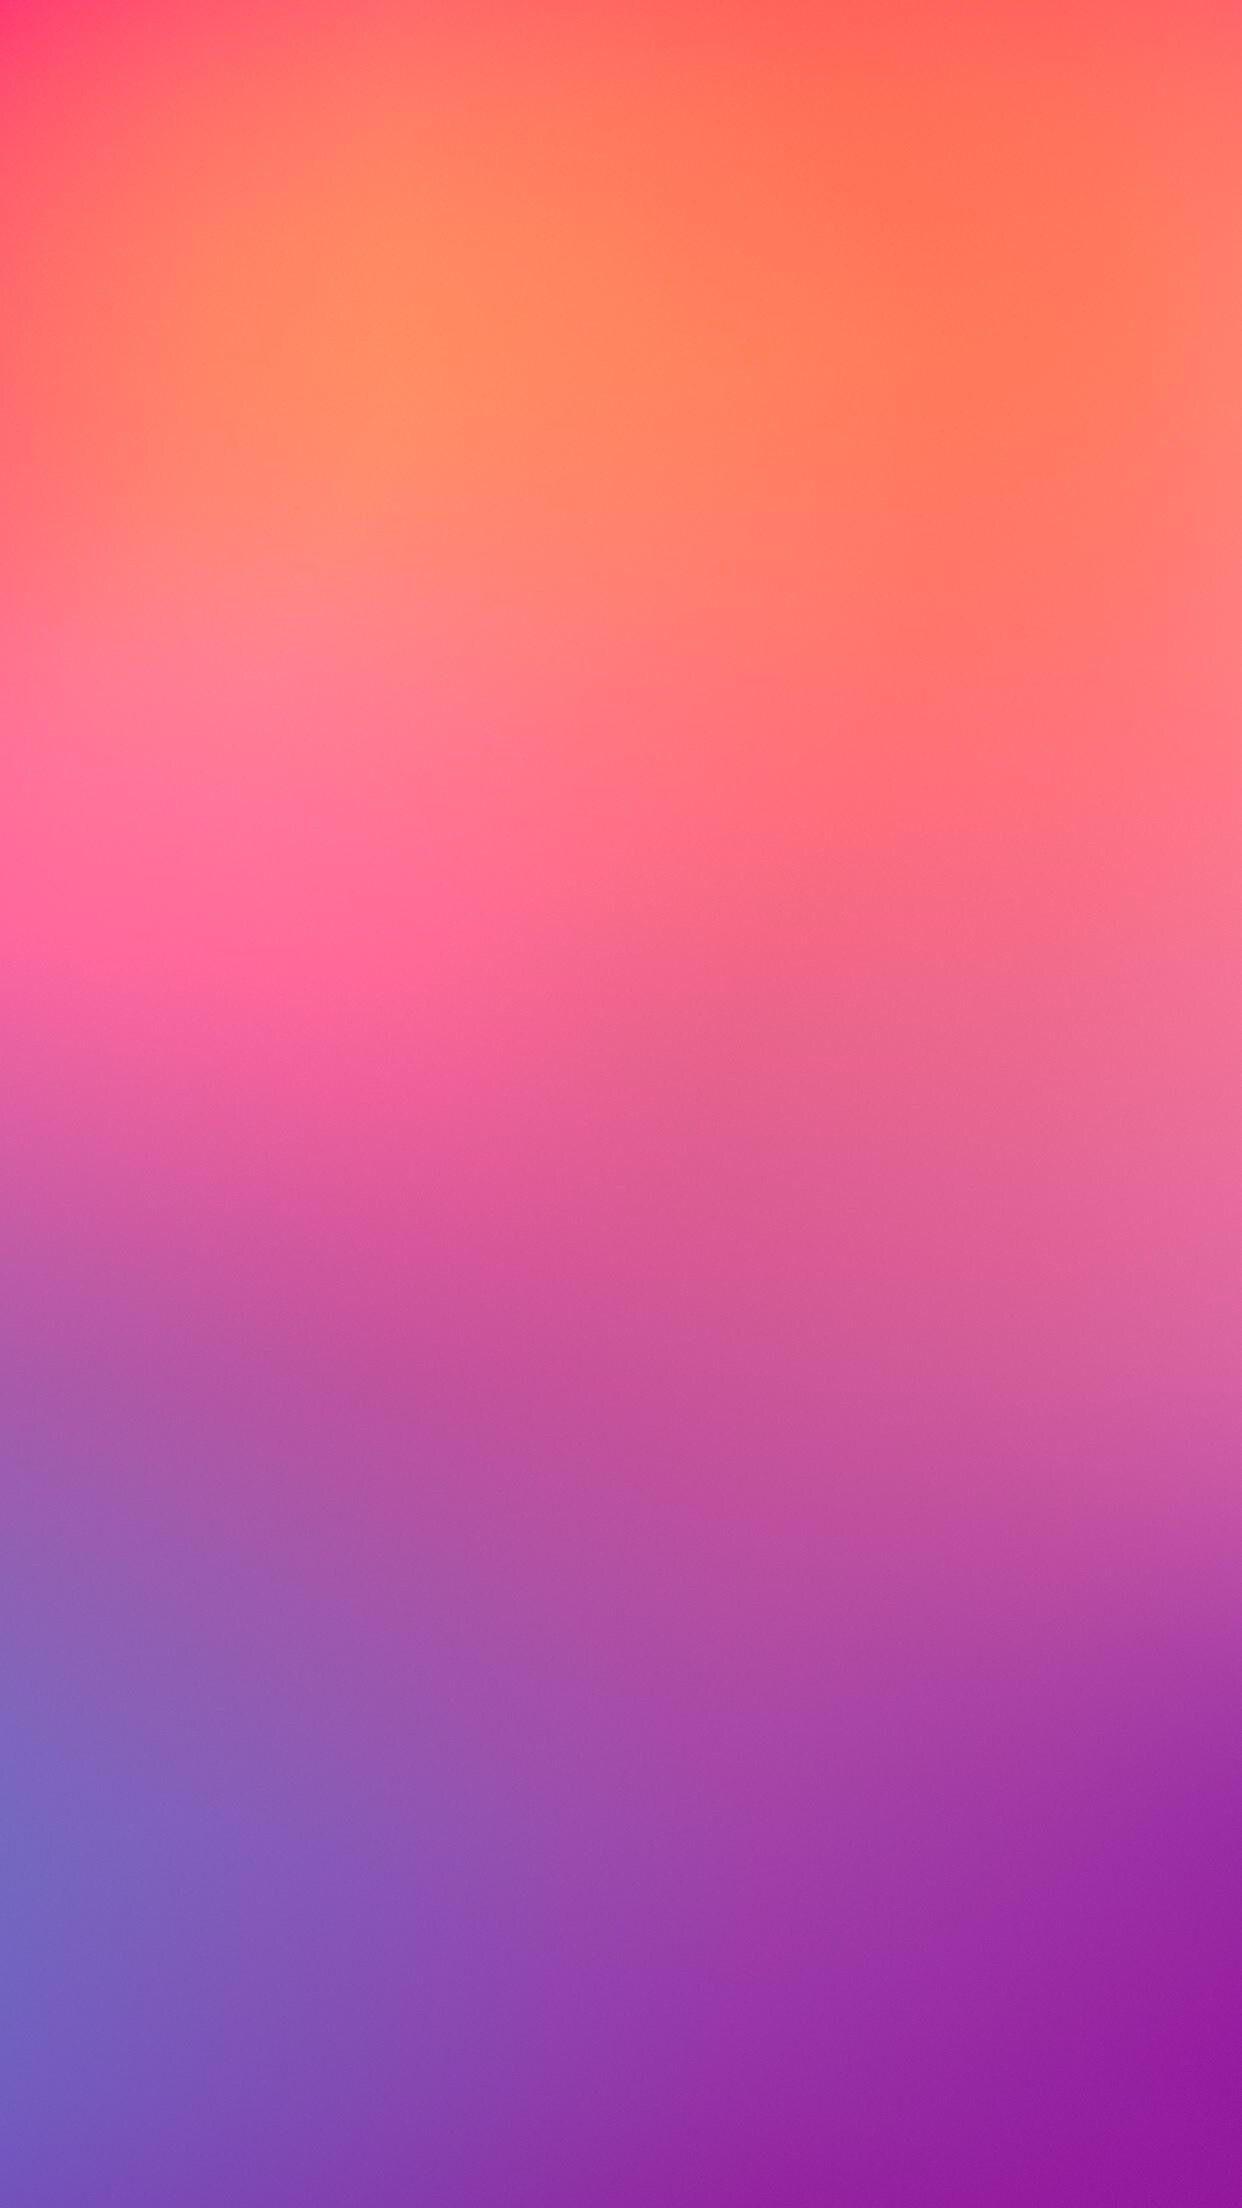 Epingle Par Malik Beradai Sur Wallpapers Fond Ecran Samsung Fond D Ecran Android Fond D Ecran Pastel